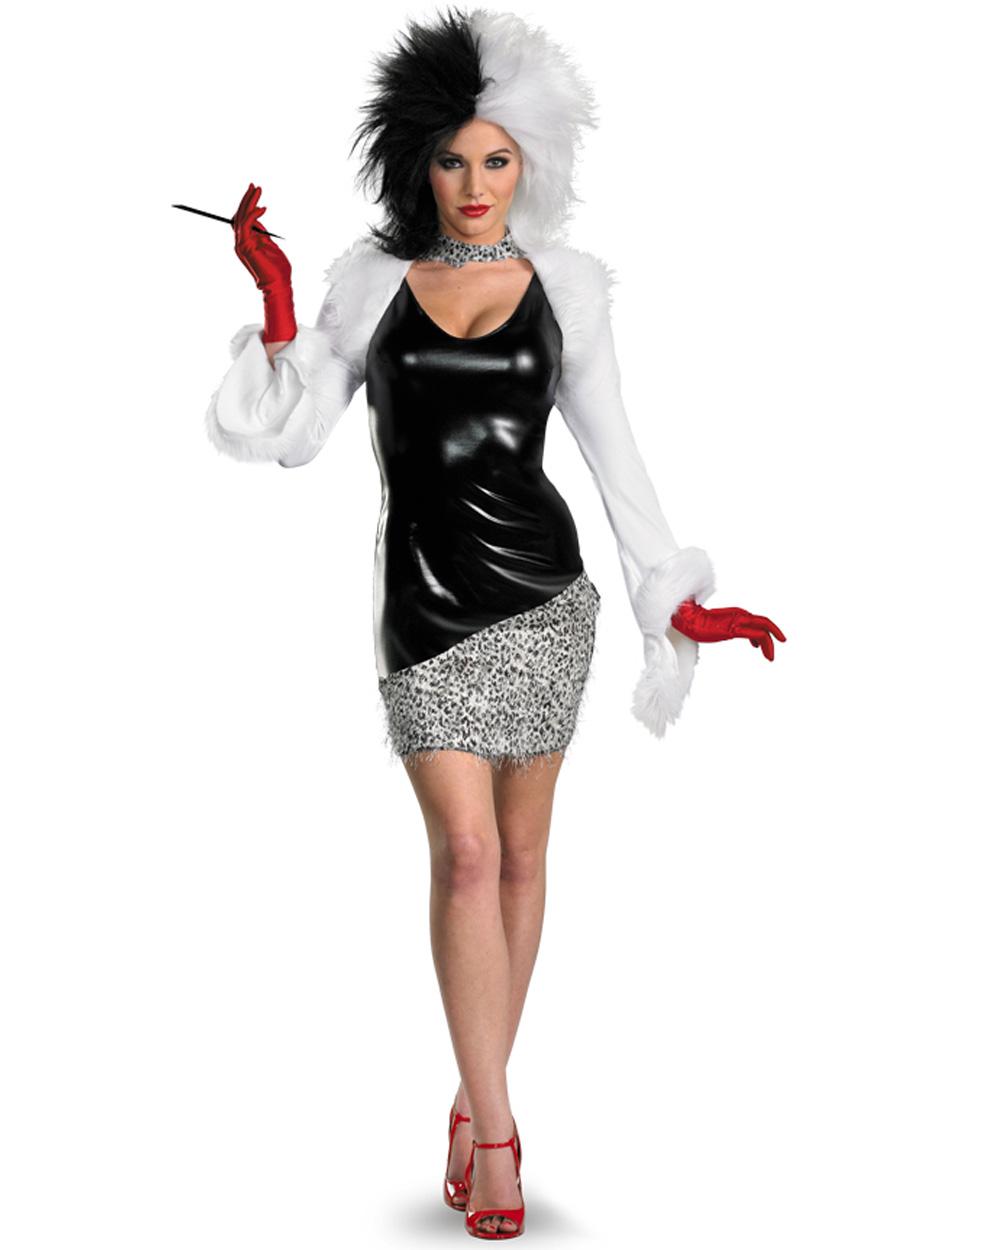 cl491 sassy evil madame costume cruella de vil 101. Black Bedroom Furniture Sets. Home Design Ideas